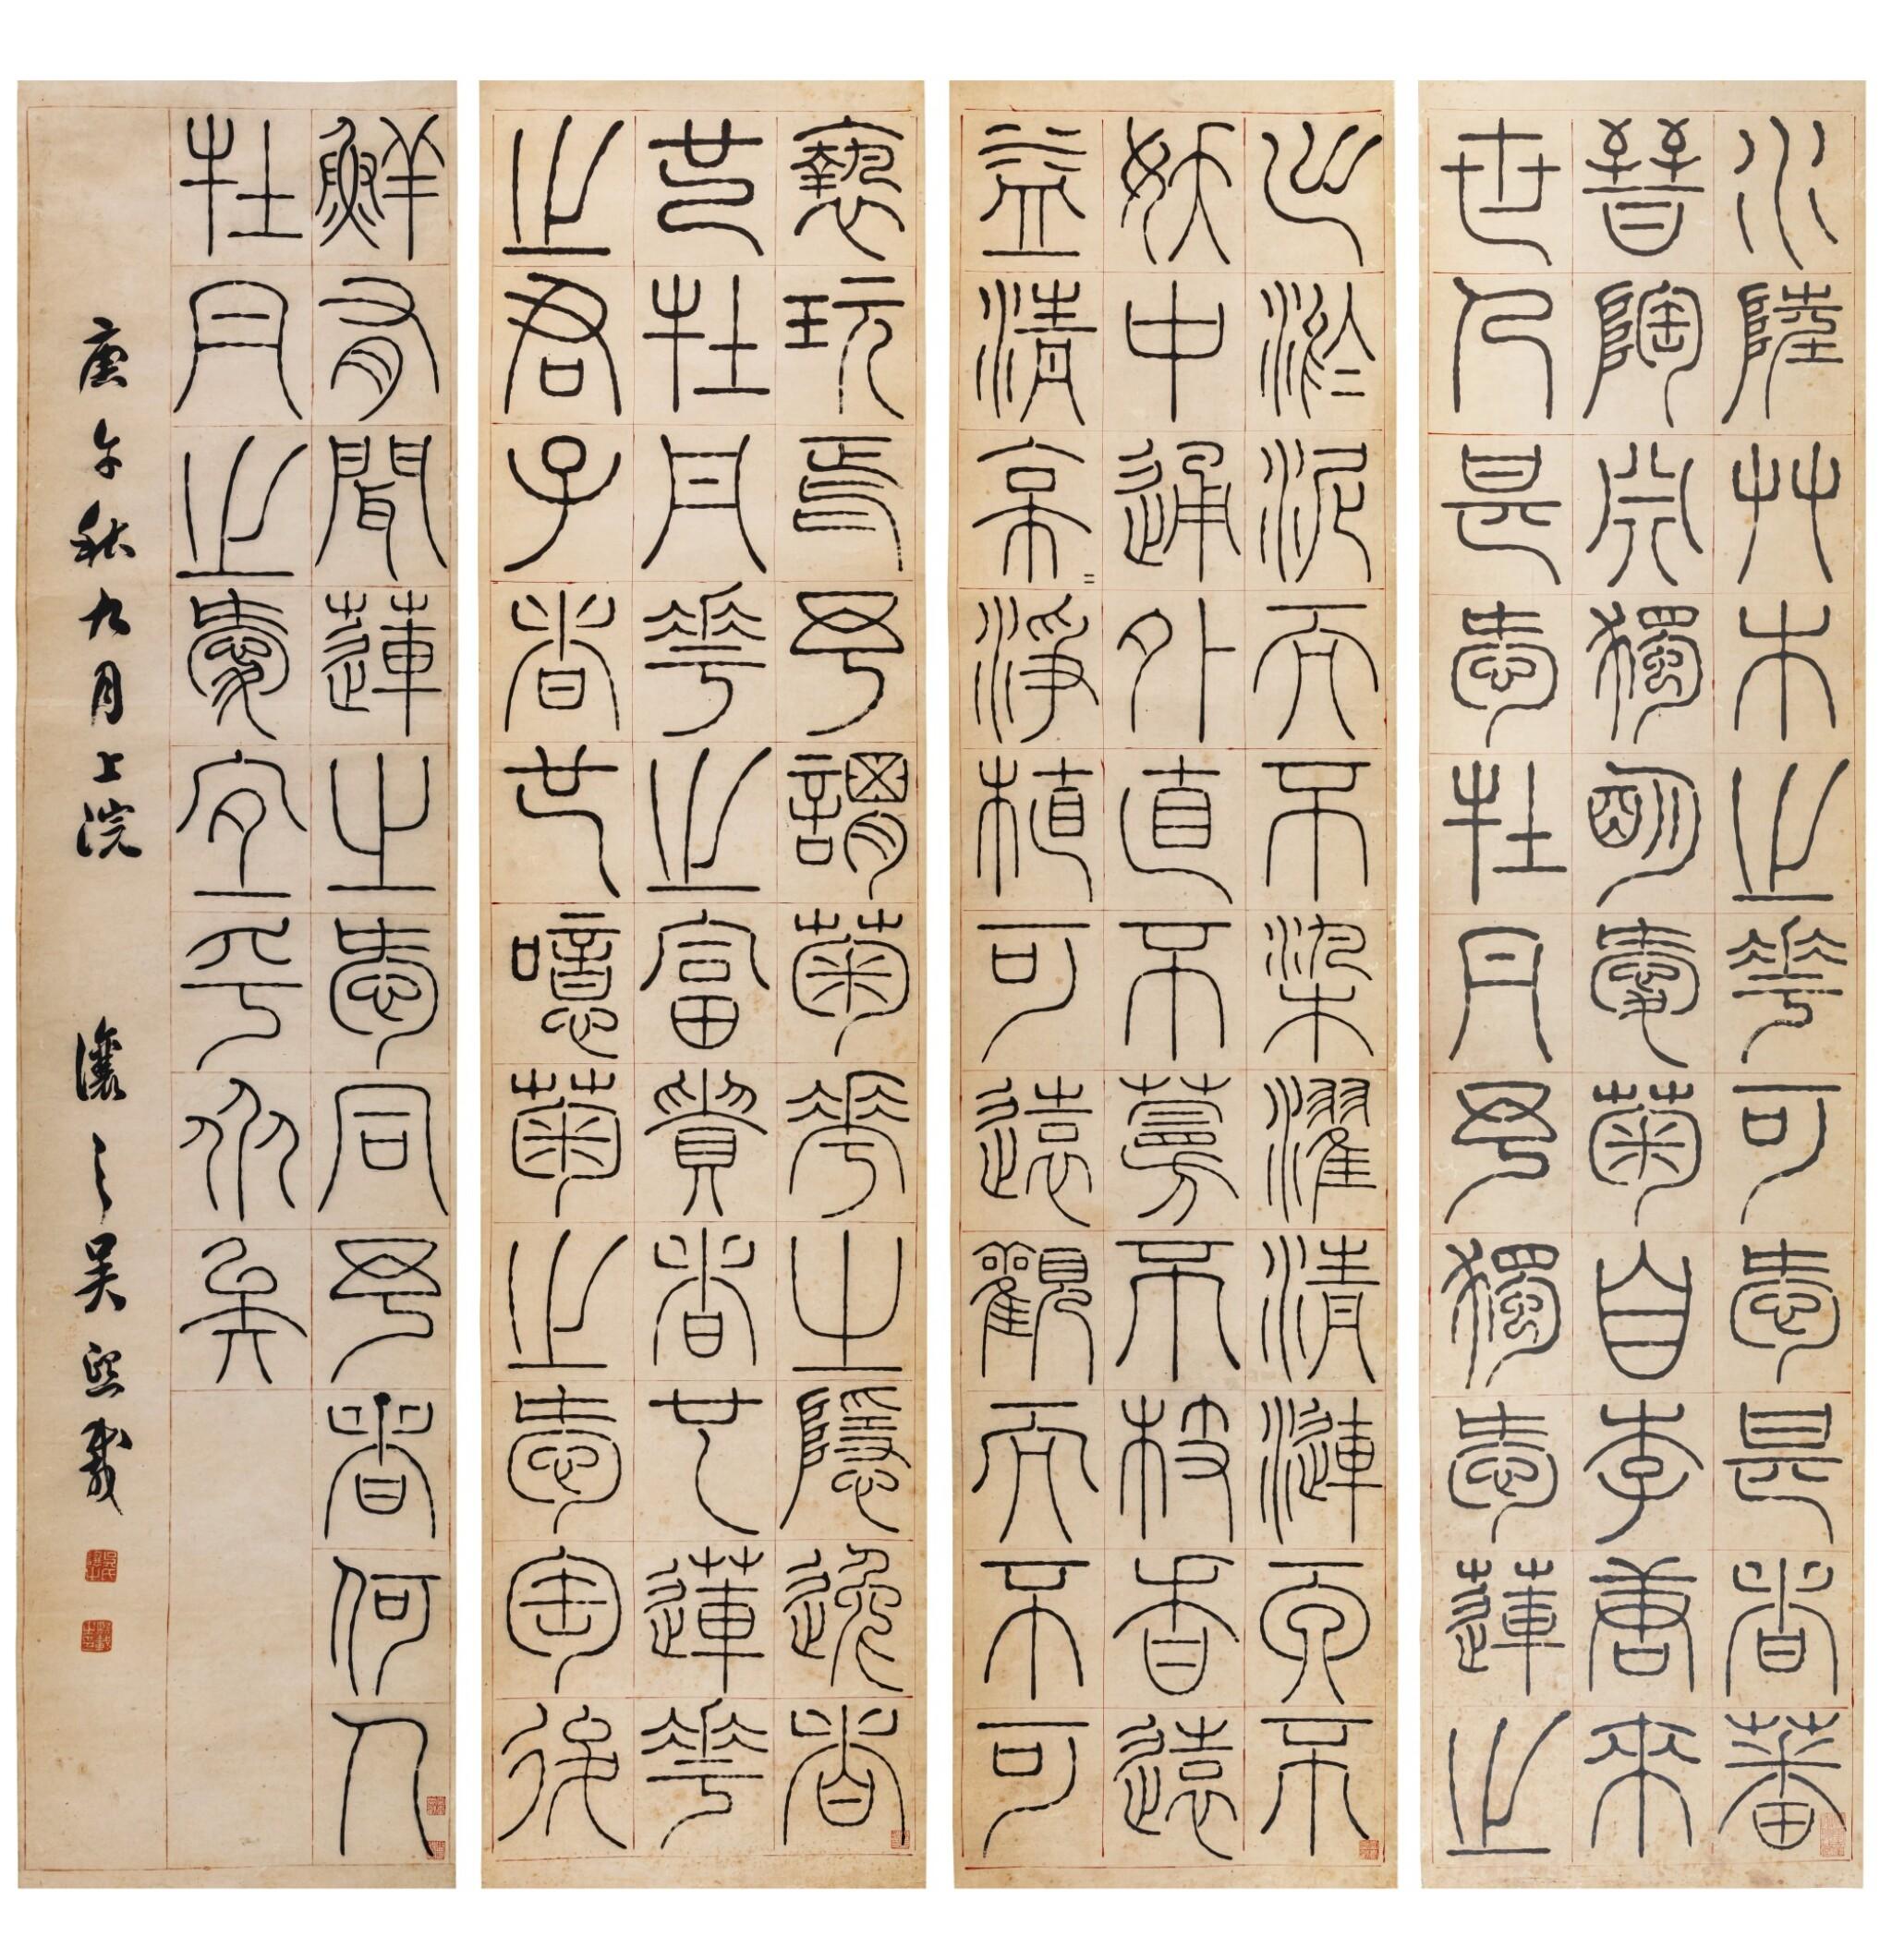 View 1 of Lot 169. Wu Xizai (1799-1870) Essai en calligraphie de style des scribes Intitulé Ai Lian Shuo | 吳熙載 篆書「愛蓮說」| Wu Xizai (1799-1870)Essay 'Ai Lian Shuo' in Calligraphy in Clerical Script.